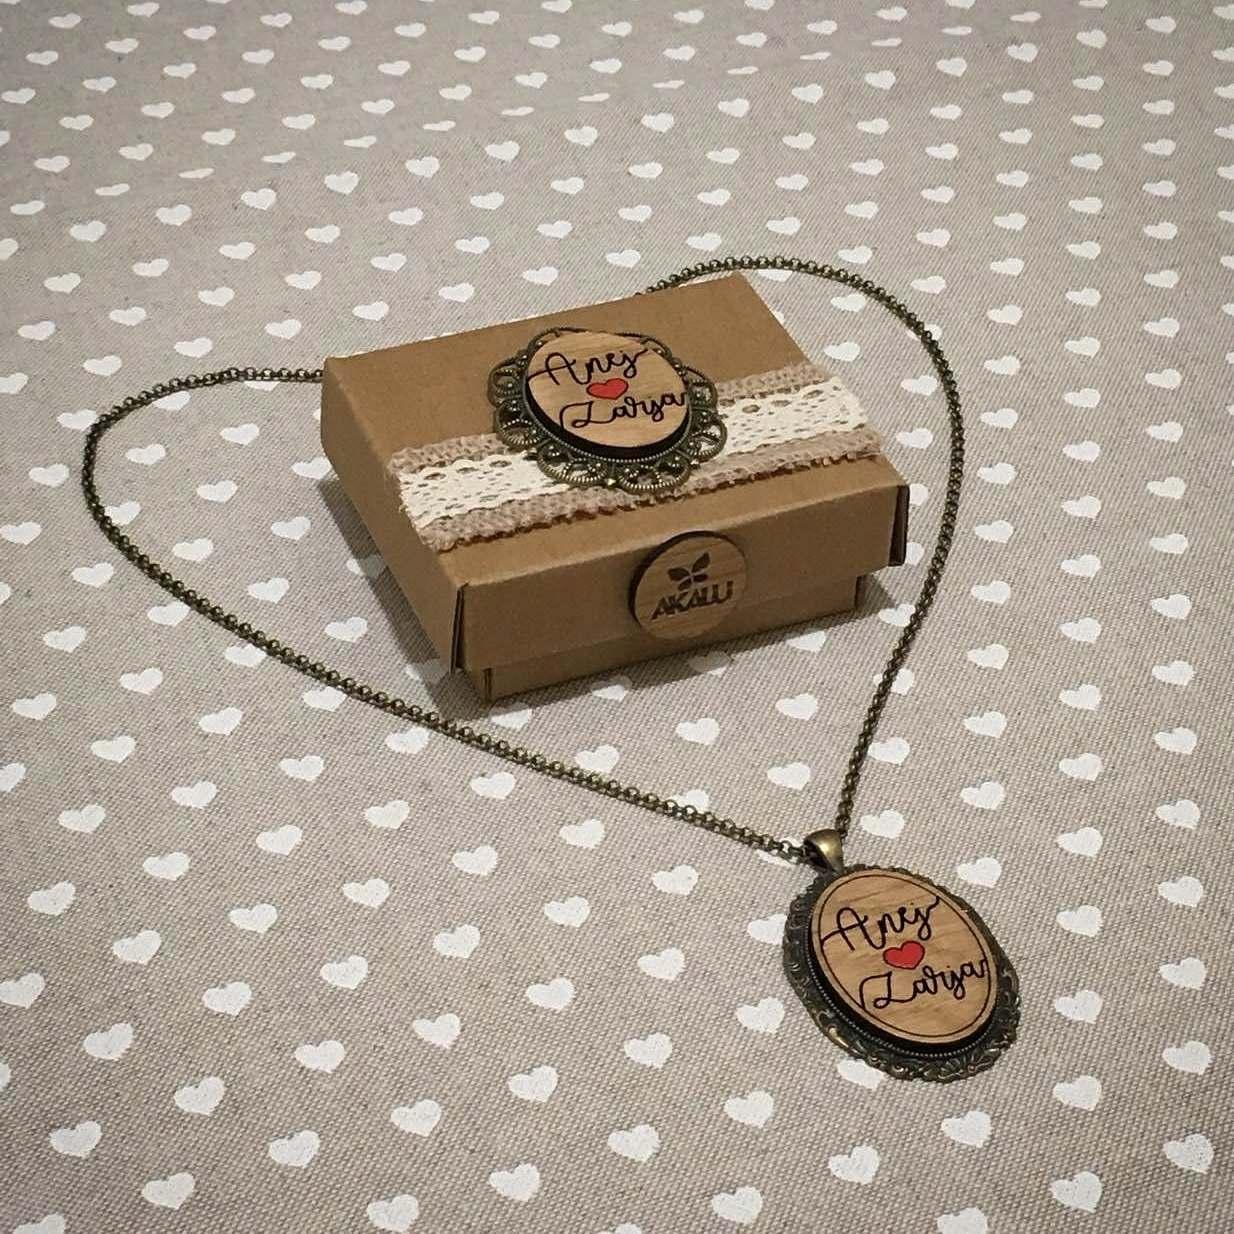 8. Leseni medaljon z imenom2